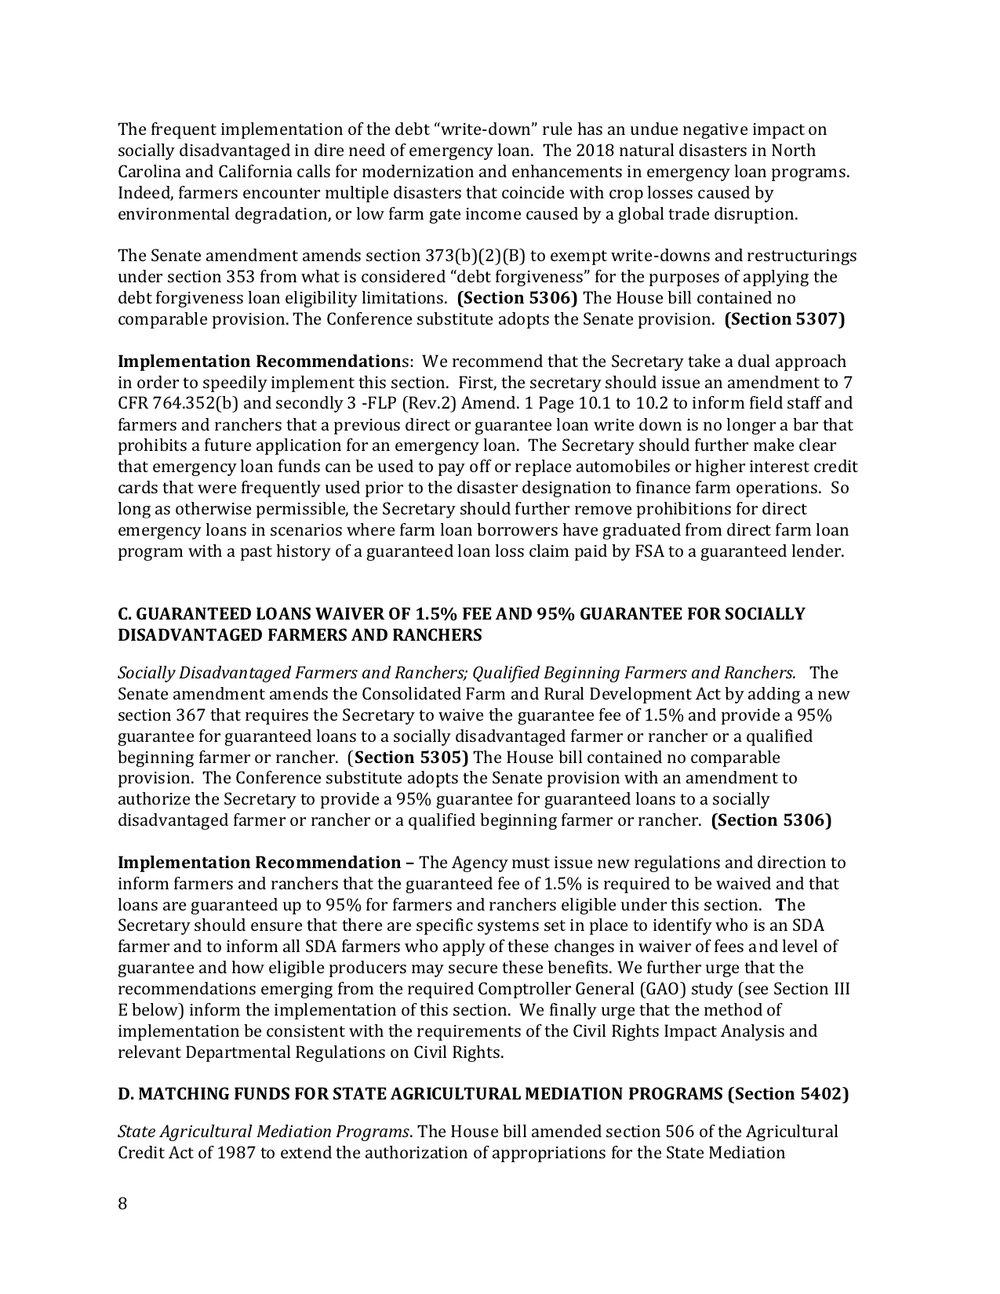 2018 Farm Bill Implementation Recommendations - Rural Co etal final March 1 page 9.jpg